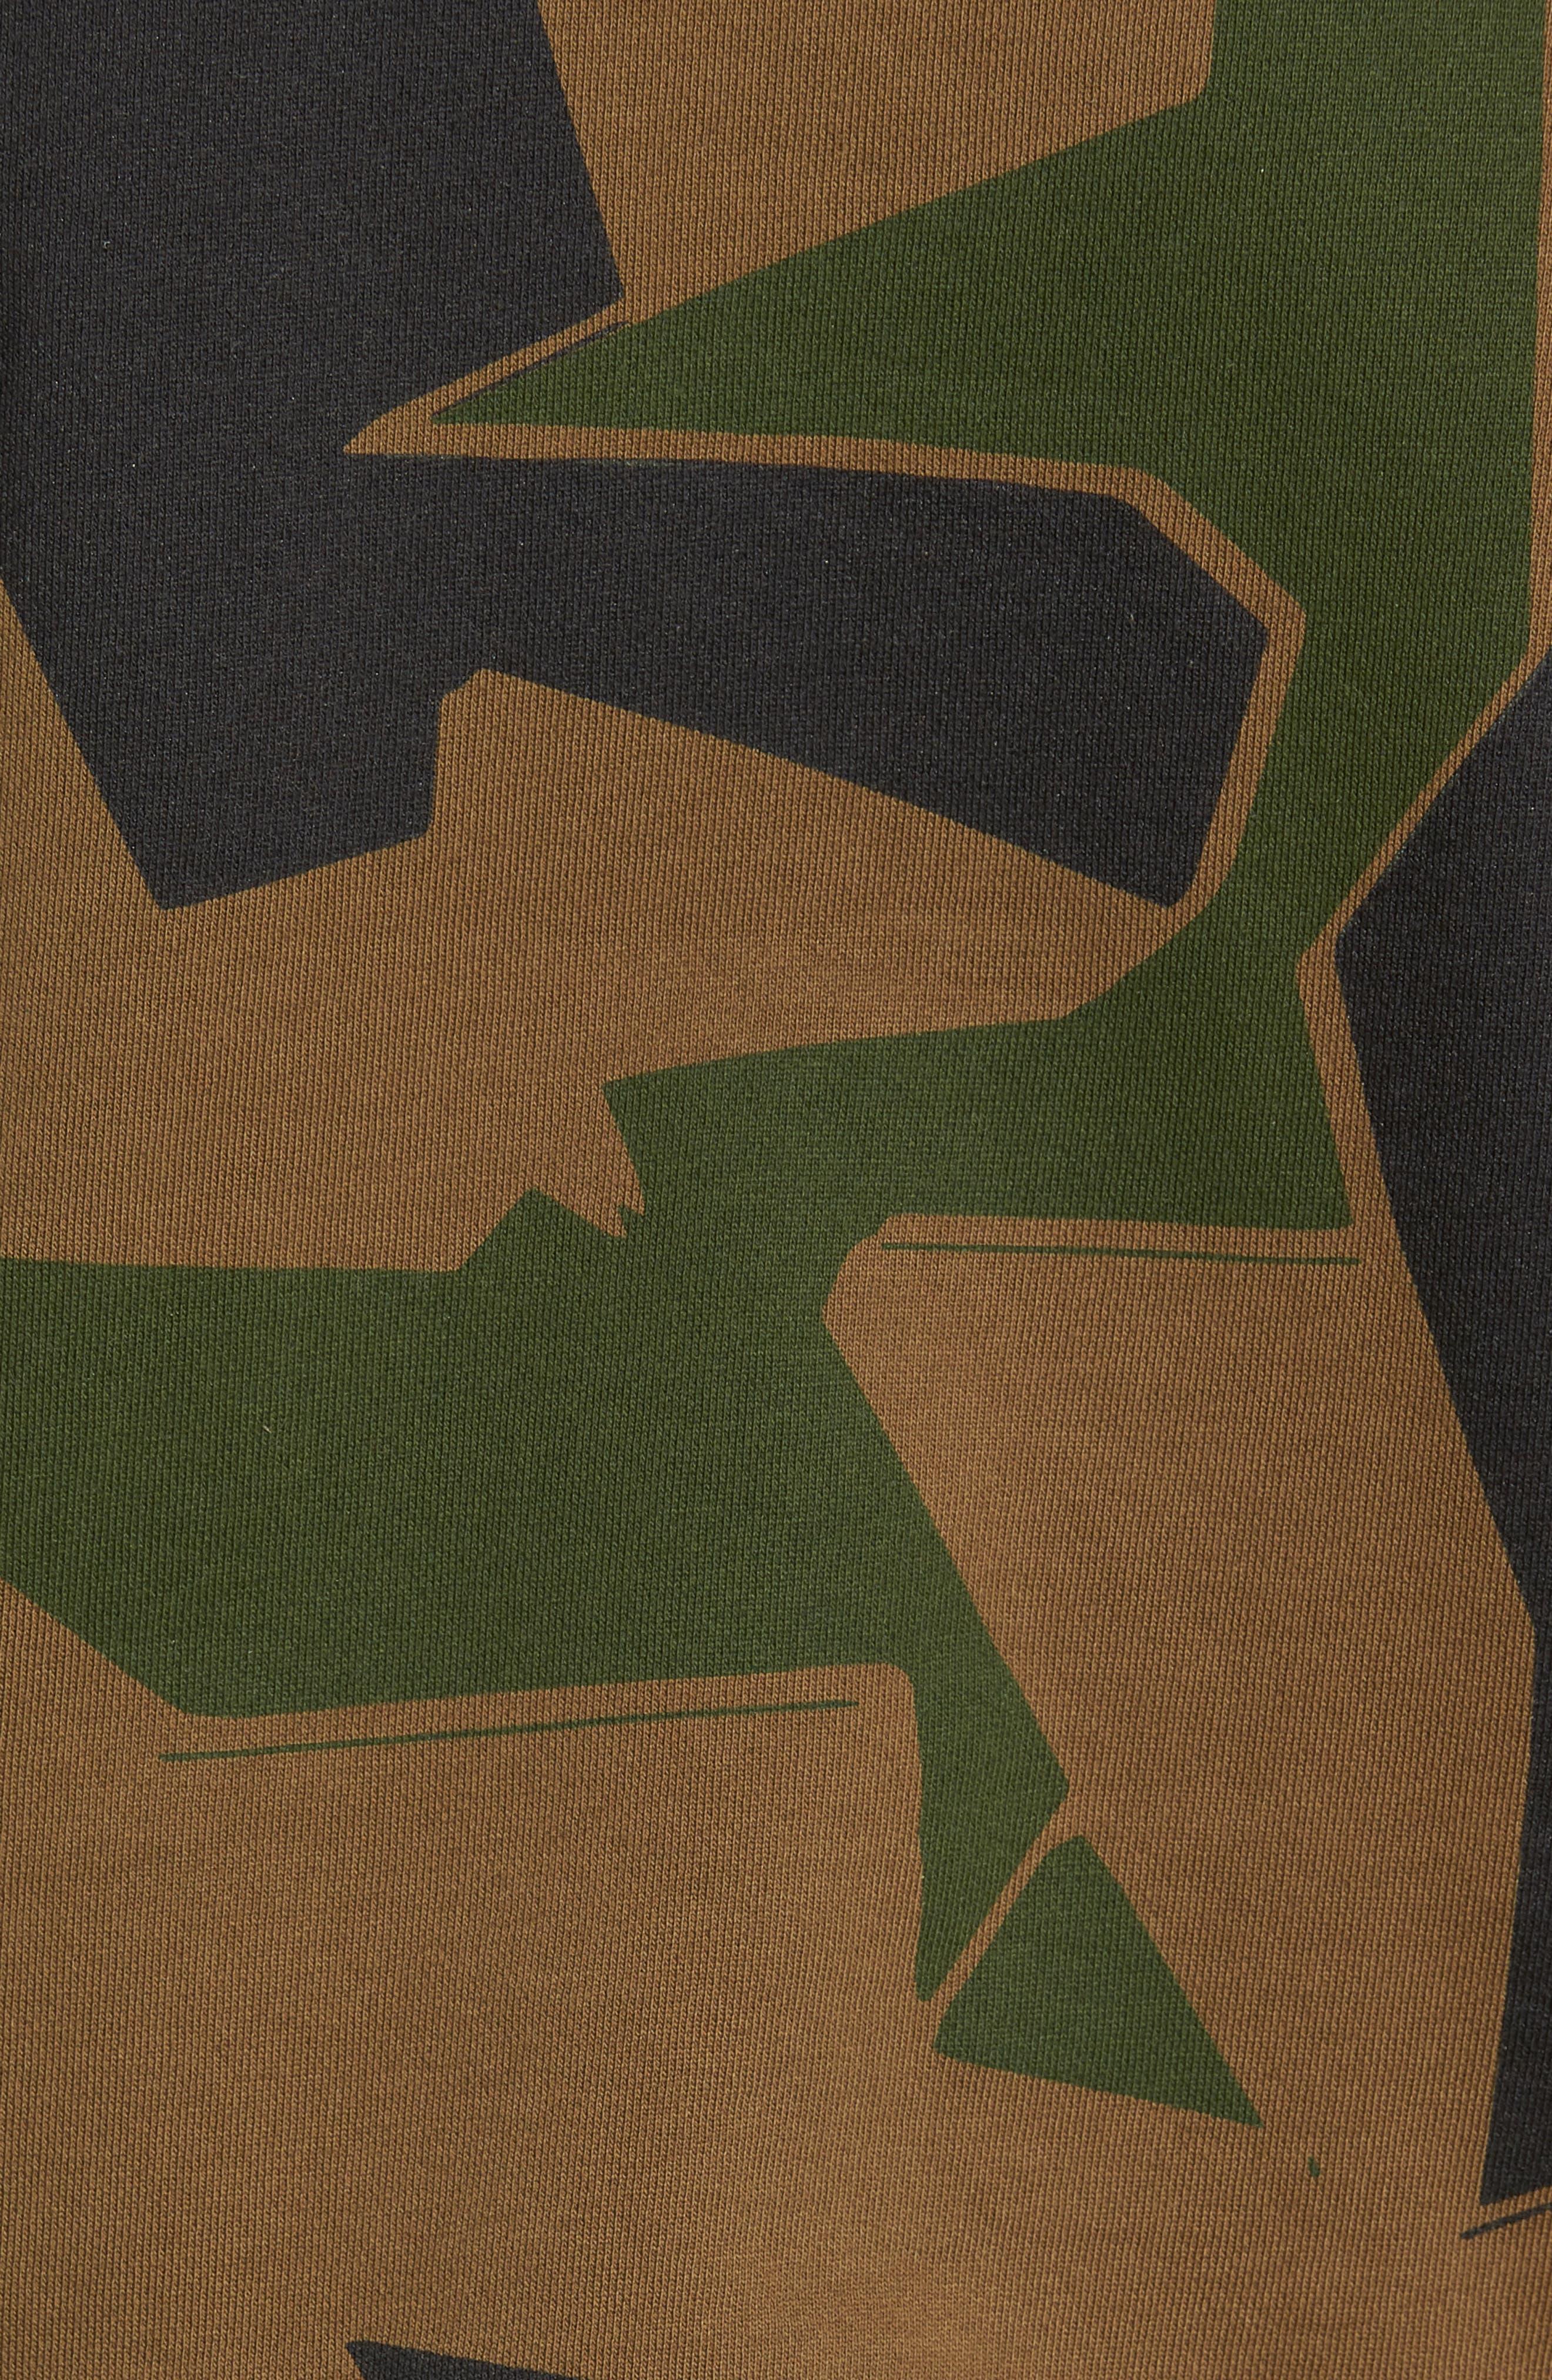 Camoflage Sweatshirt,                             Alternate thumbnail 5, color,                             WOODLAND CAMO